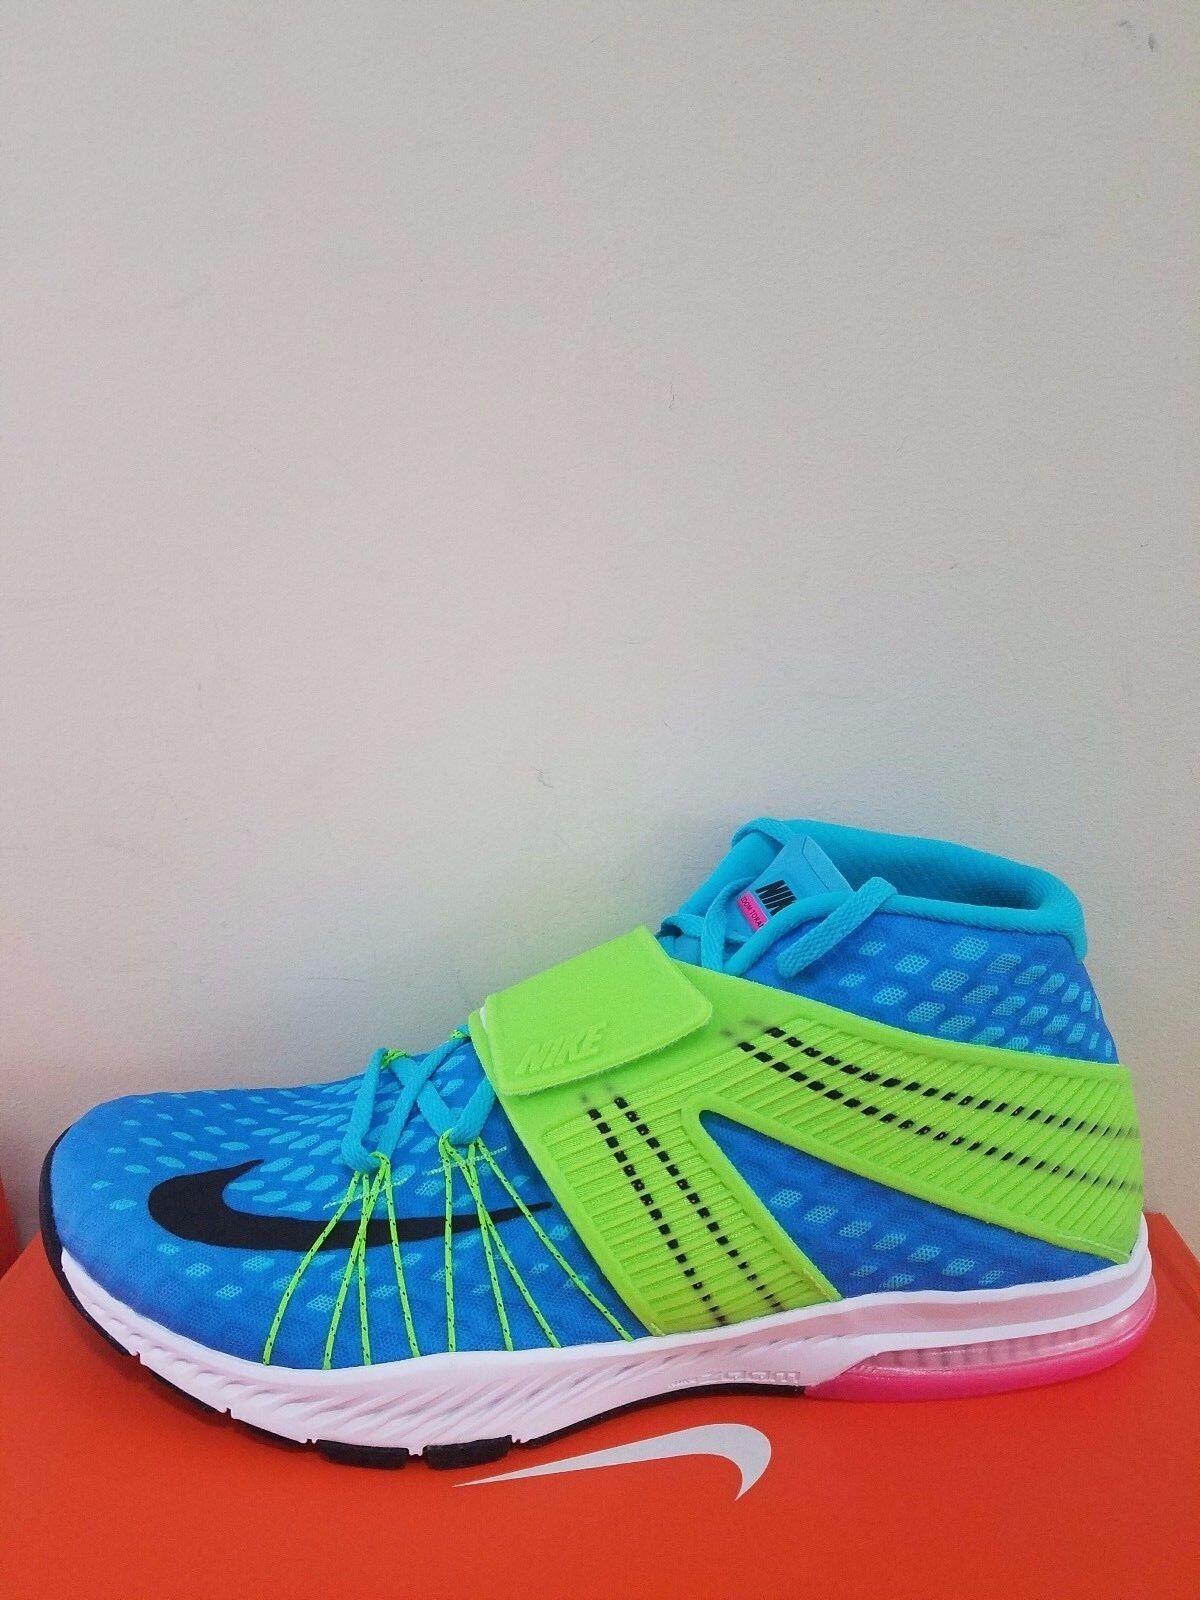 Nike Men's Zoom Train Toranada sneakers Size 11 NIB